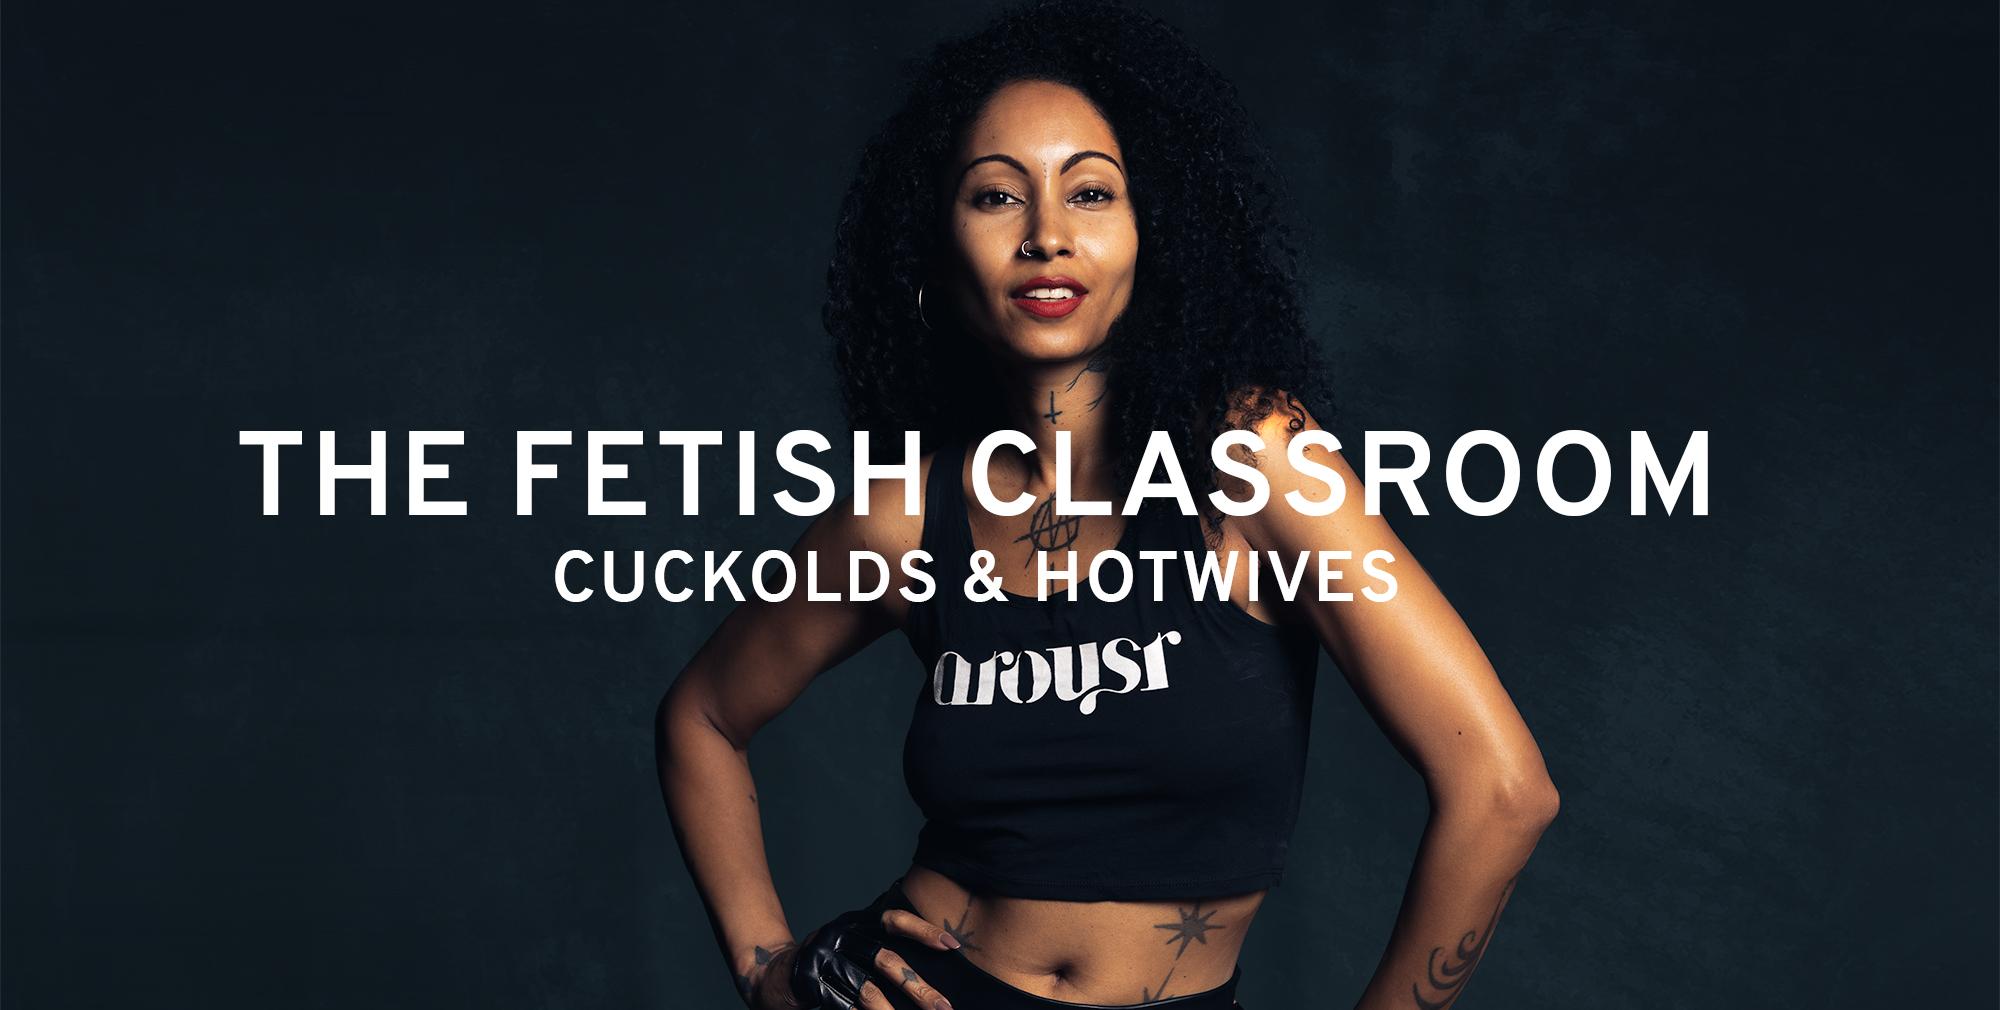 Cuckold Chat